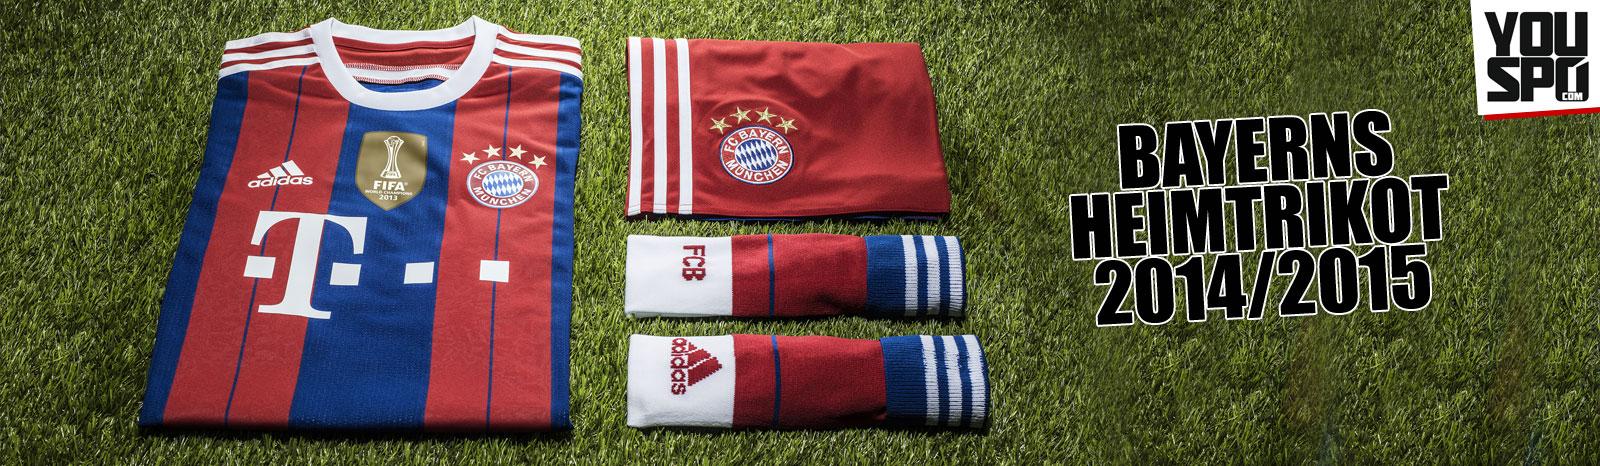 FC Bayern München Heimtrikot 2014/2015